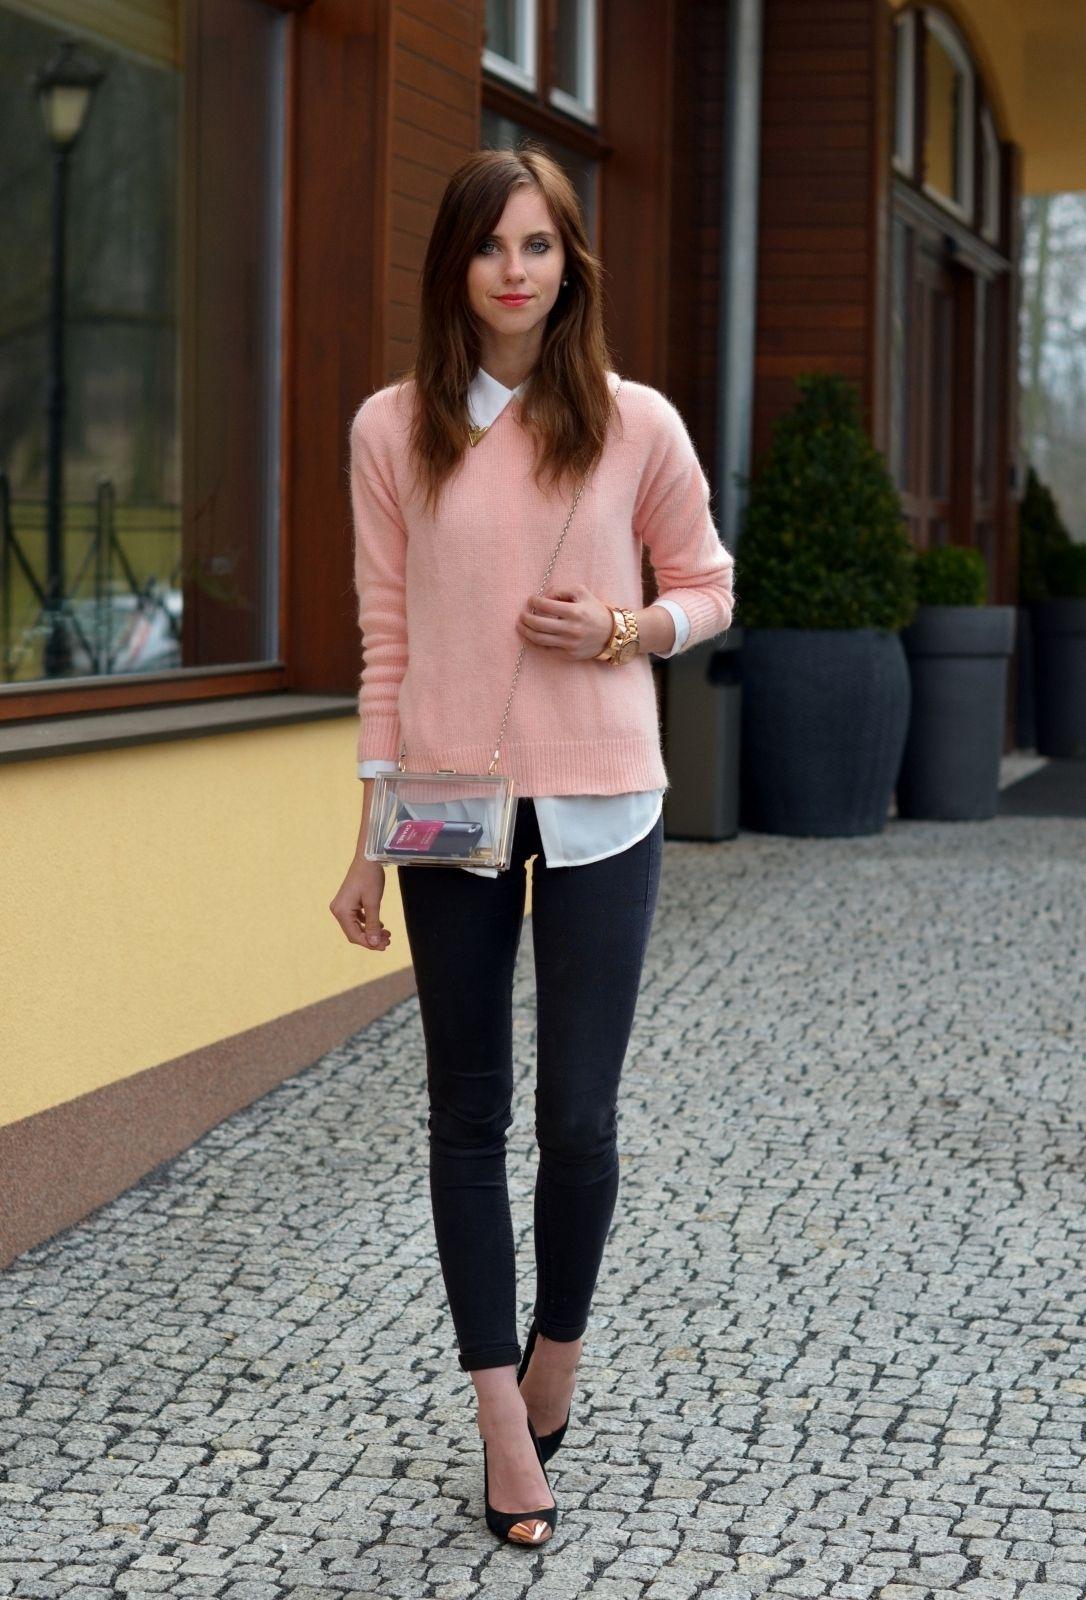 pastel pink | Elements of Style | Pinterest | Pastel pink, Pastels ...